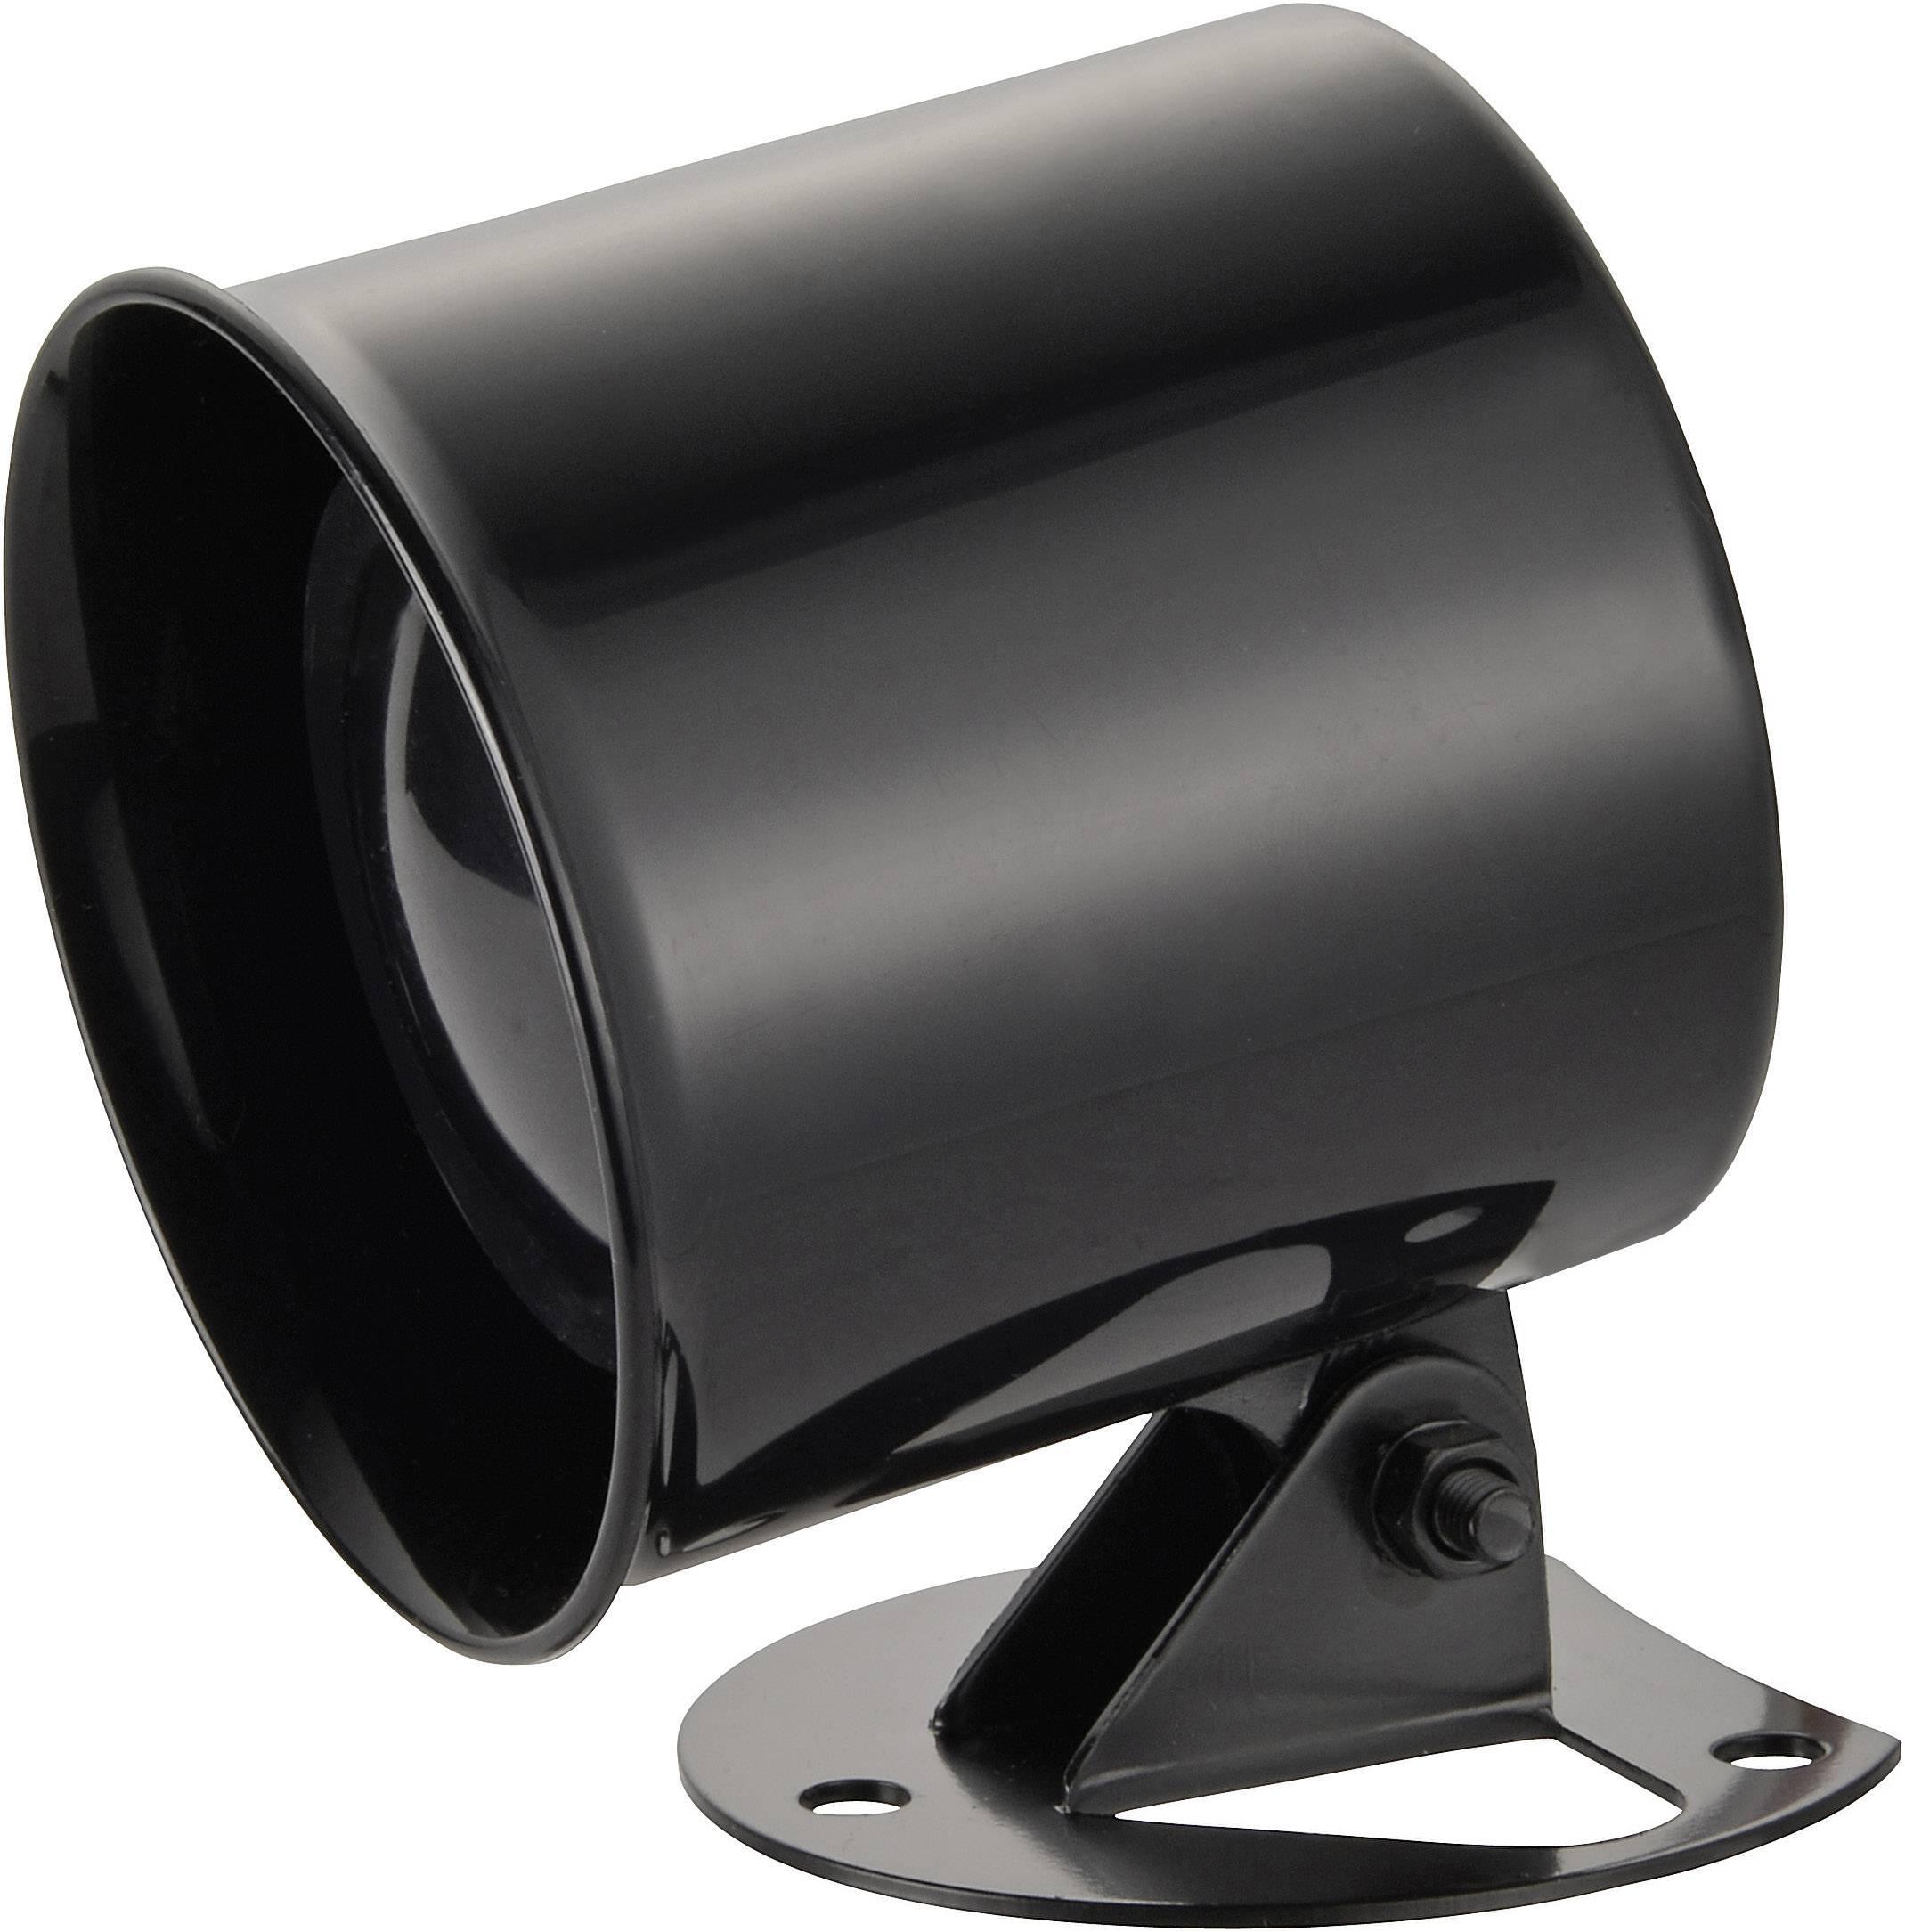 Alarmová piezo siréna LI-102, 110 dB/1 m, 12 V